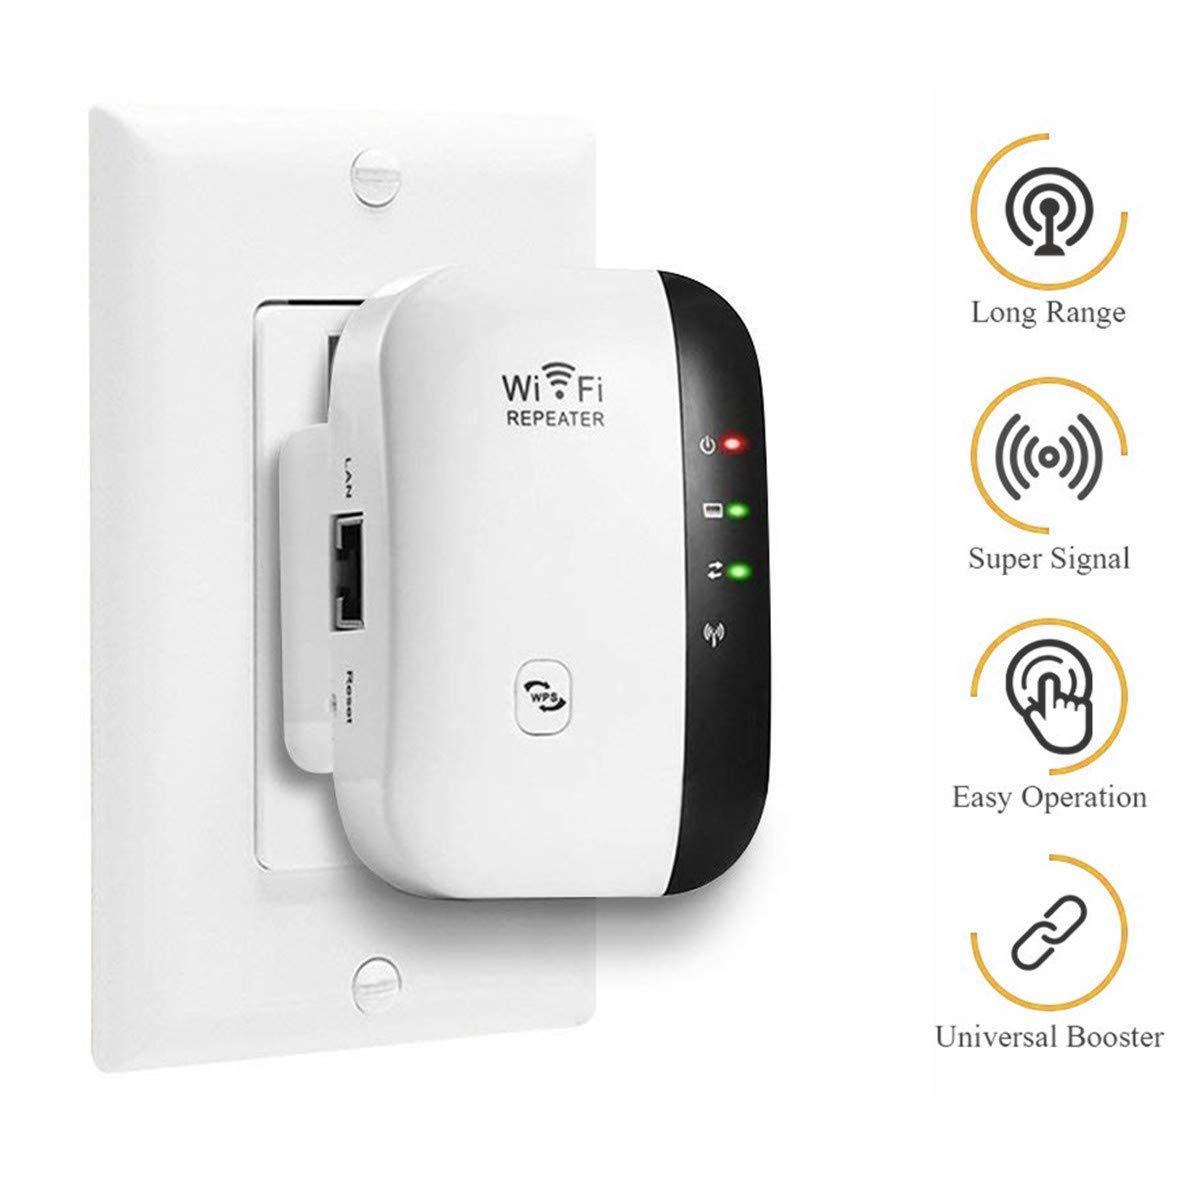 Беспроводной Wi-Fi ретранслятор усилитель сигнала 802.11N/B/G Wi-Fi диапазон расширитель 300 Мбит/с усилитель сигнала Repetidor WiFi Wps шифрование